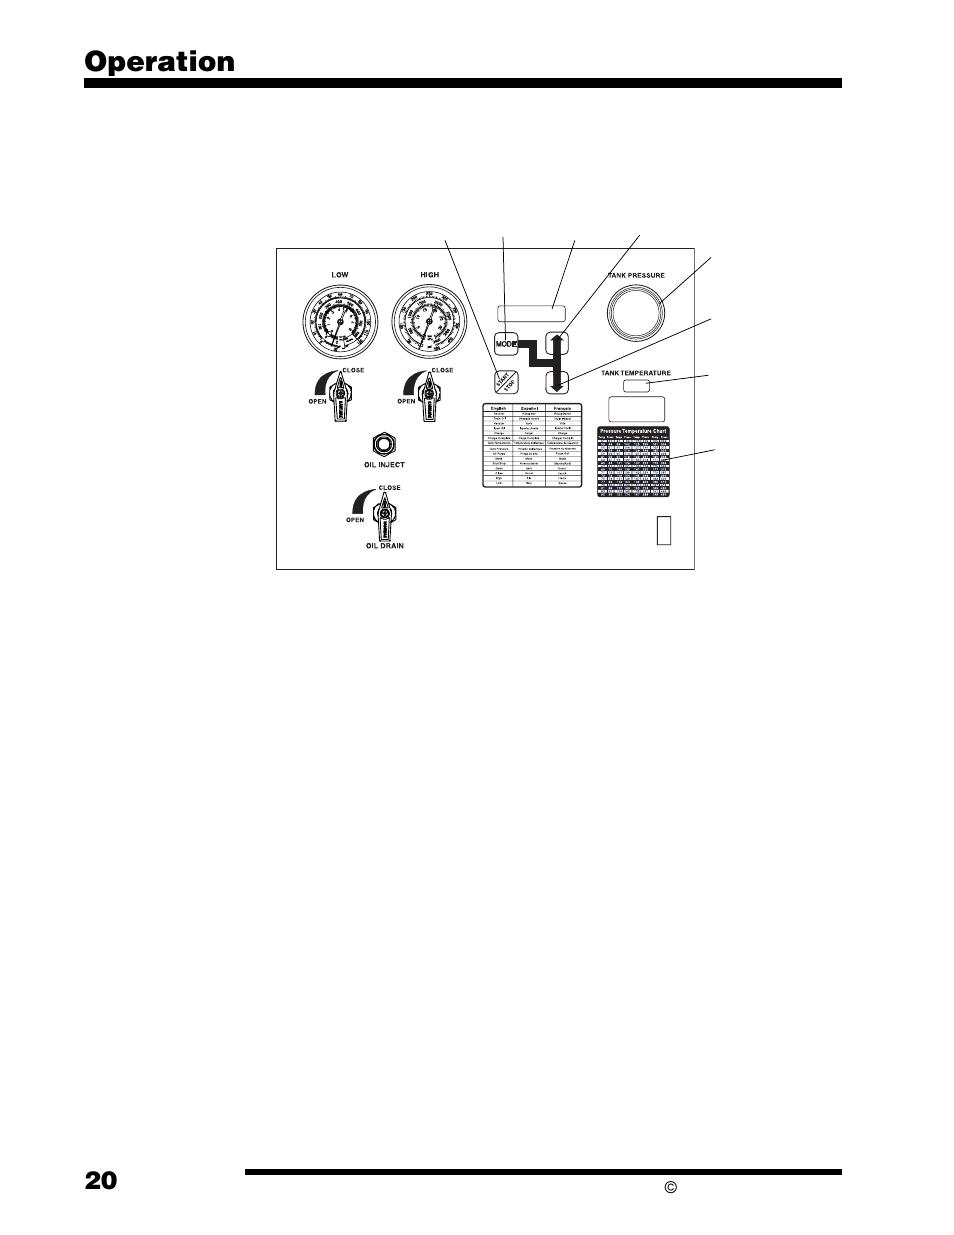 operation purging air from the internal storage vessel robinair rh manualsdir com Robinair 34788 Parts List spx robinair cooltech 700 manual